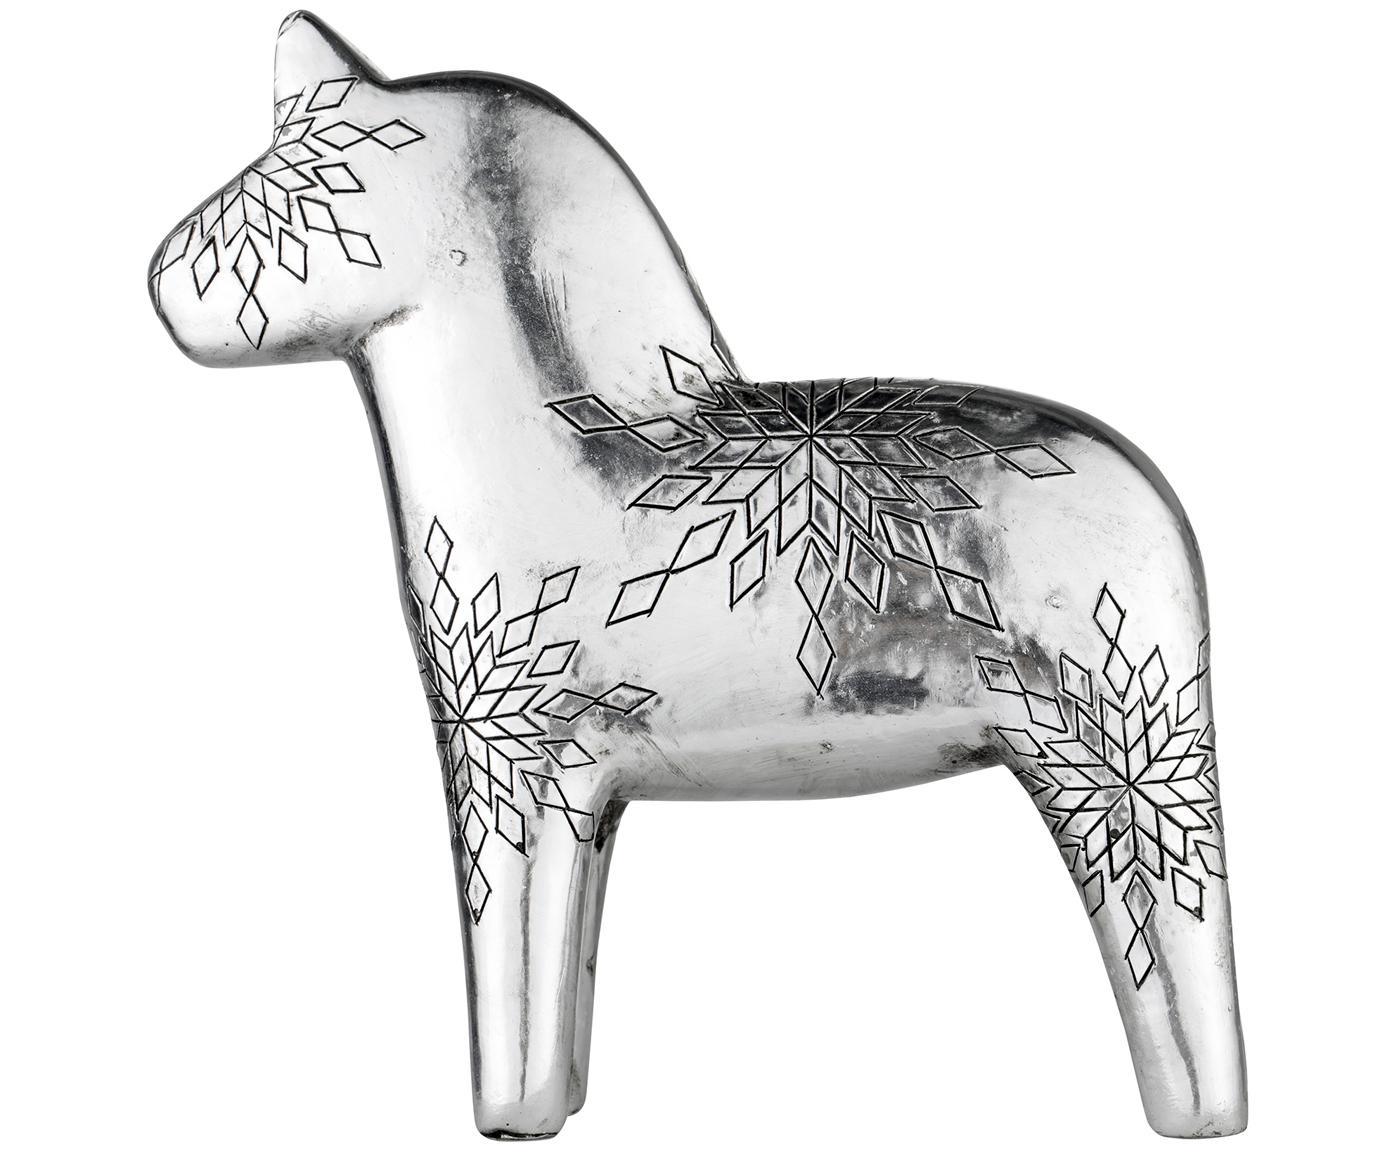 Deko-Objekt Serafina Horse, Polyresin, Silberfarben, 16 x 16 cm